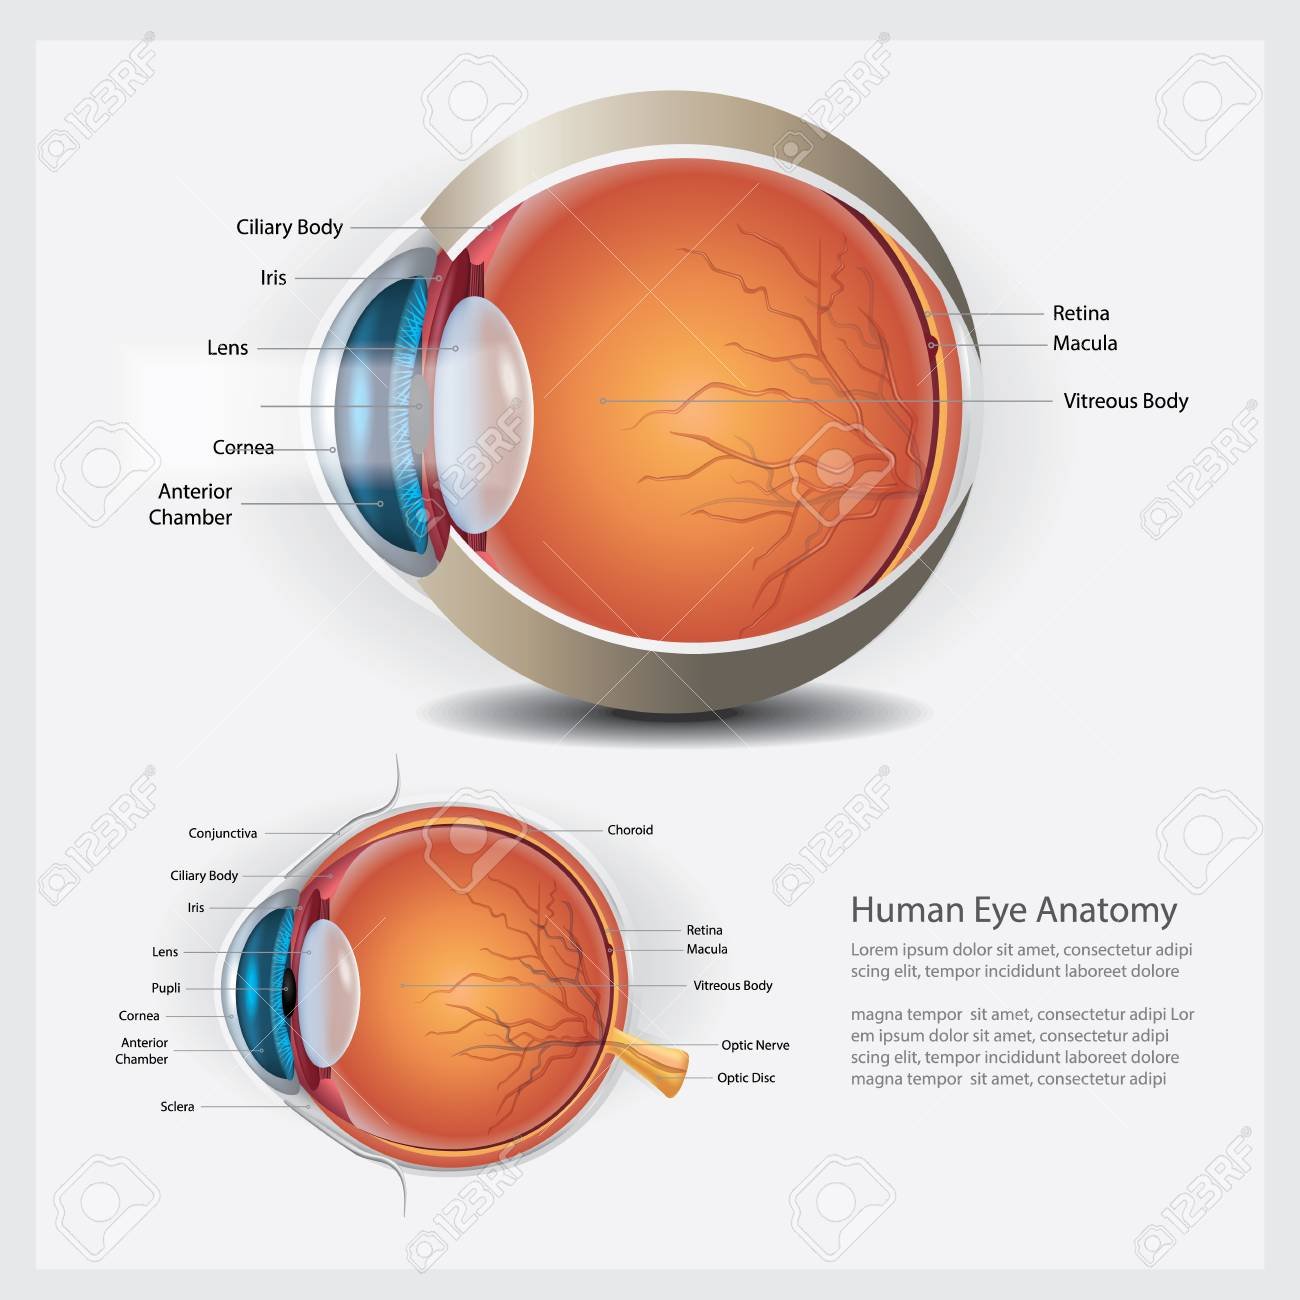 human eye anatomy and